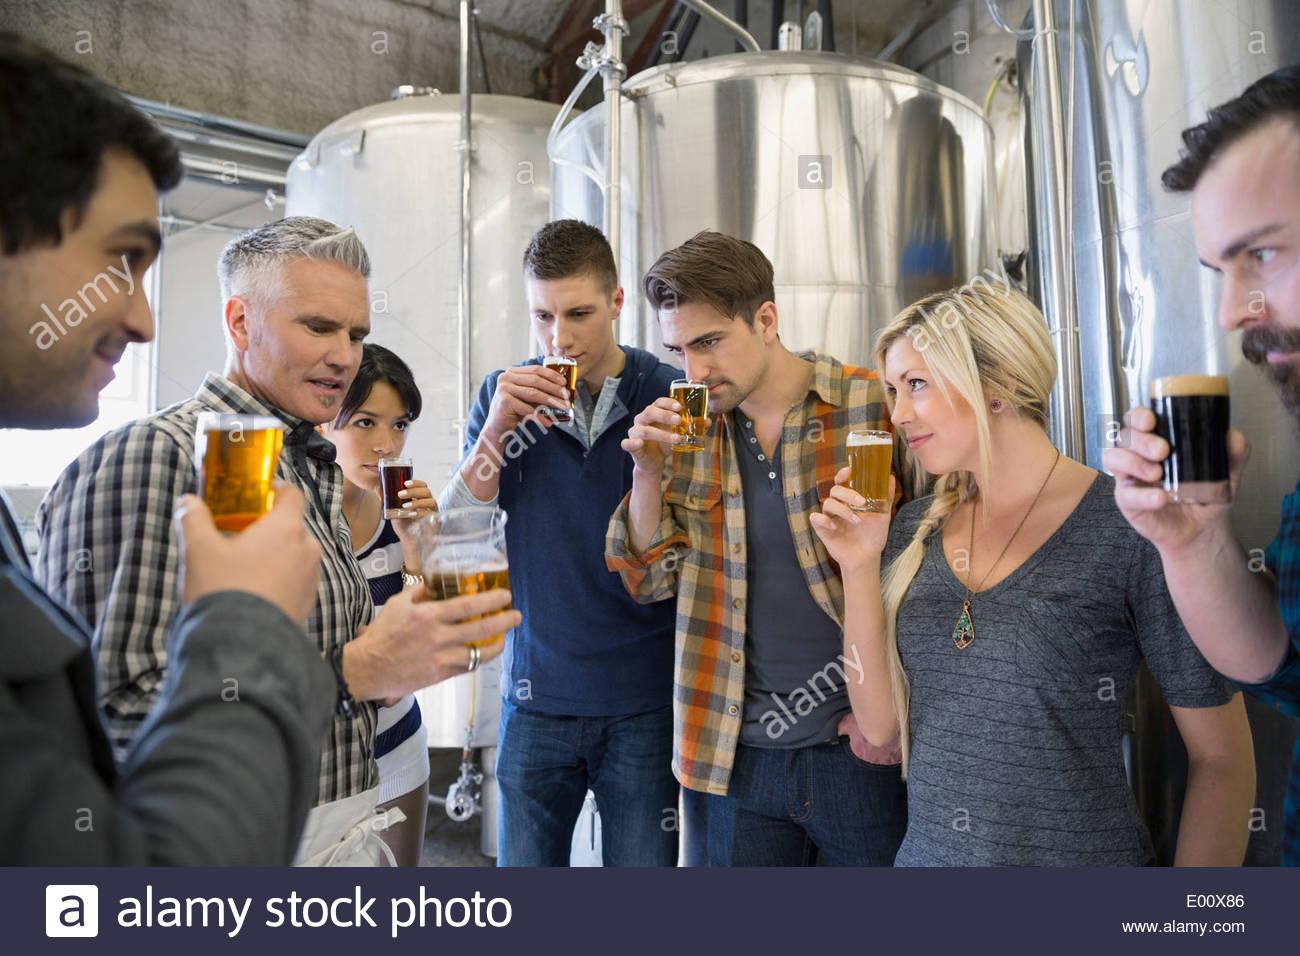 Friends beer tasting at brewery - Stock Image